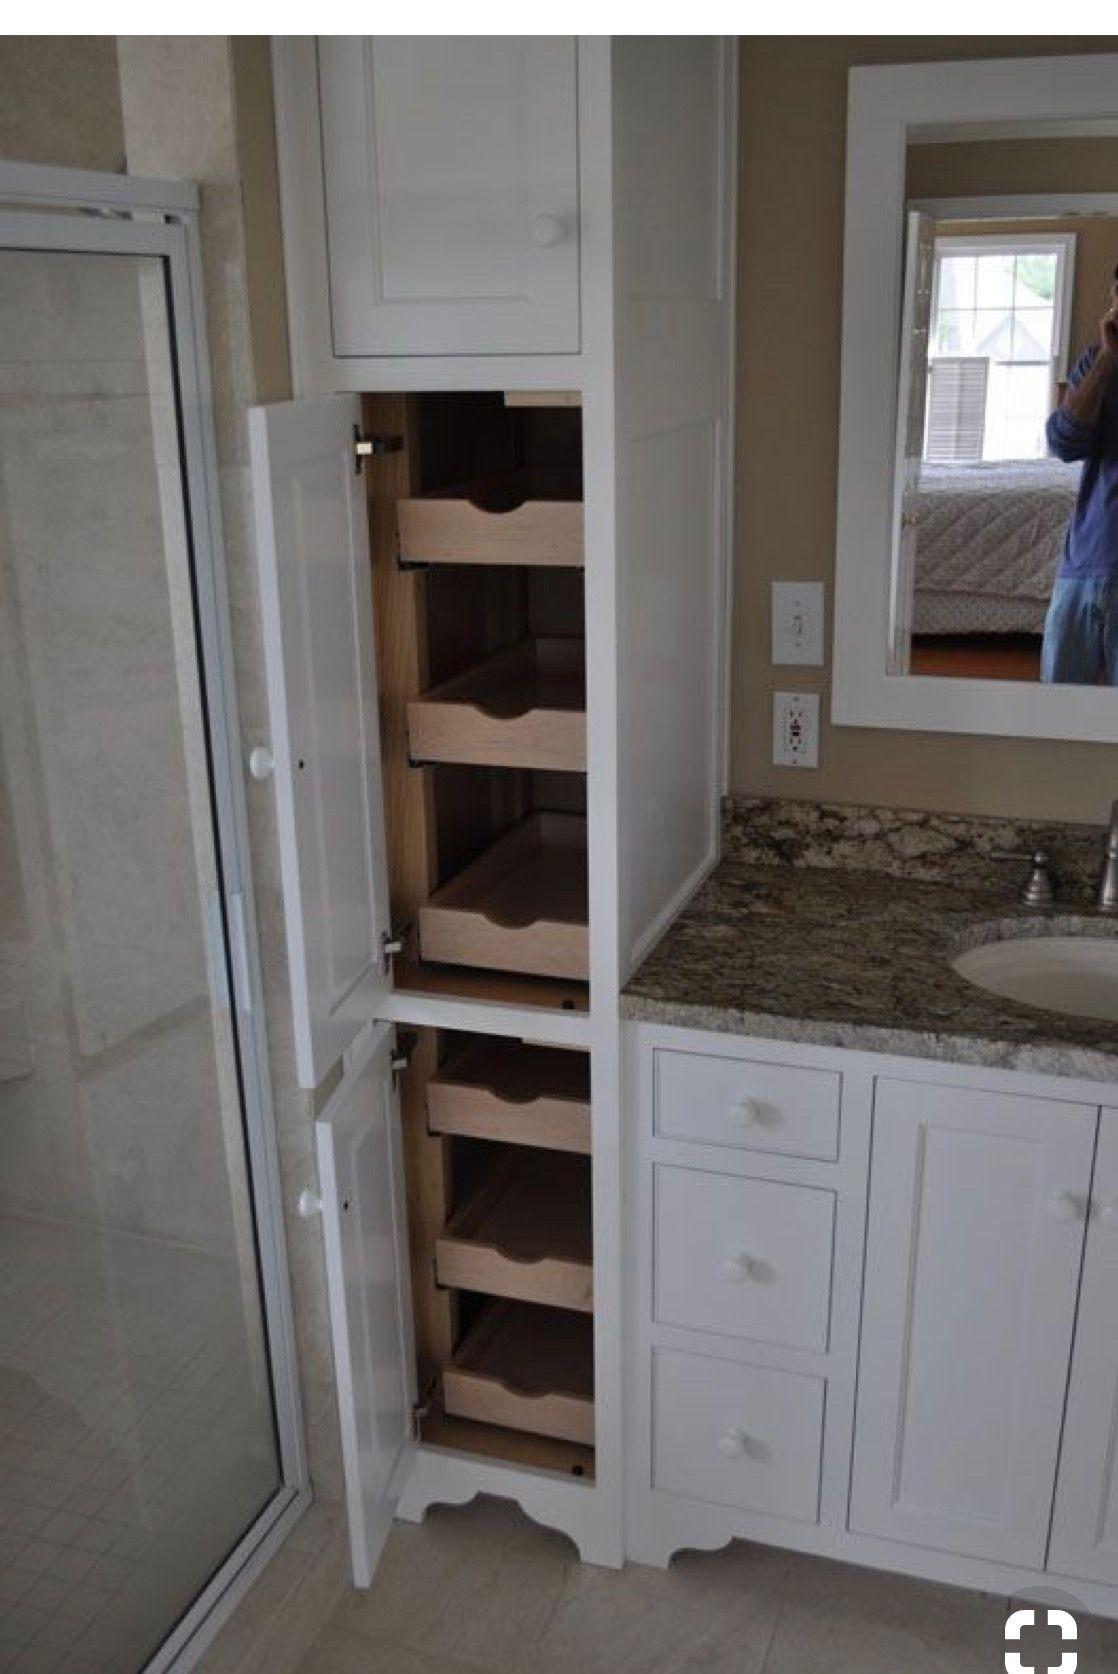 Tall Linen Tower Cabinet Organizer Storage Shelves Doors Bathroom Salon Wood